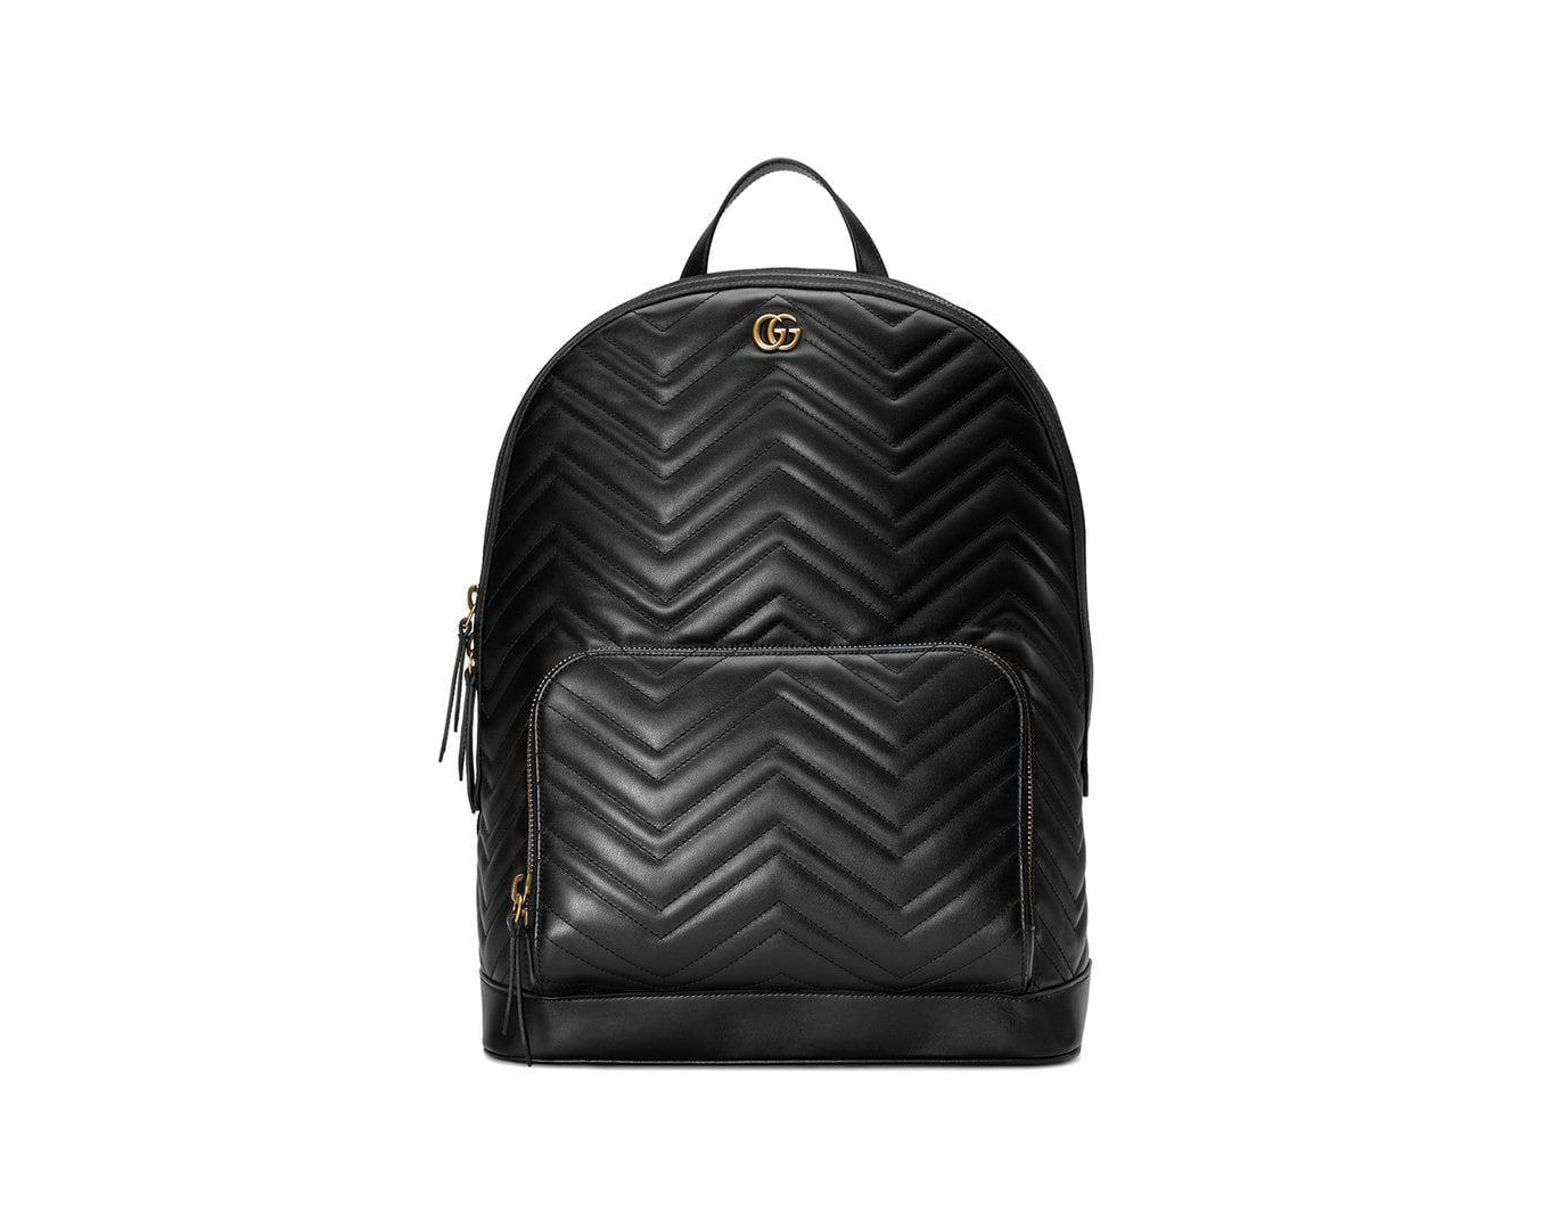 0dca211d6 Gucci GG Marmont Matelassé Backpack in Black for Men - Save 13% - Lyst